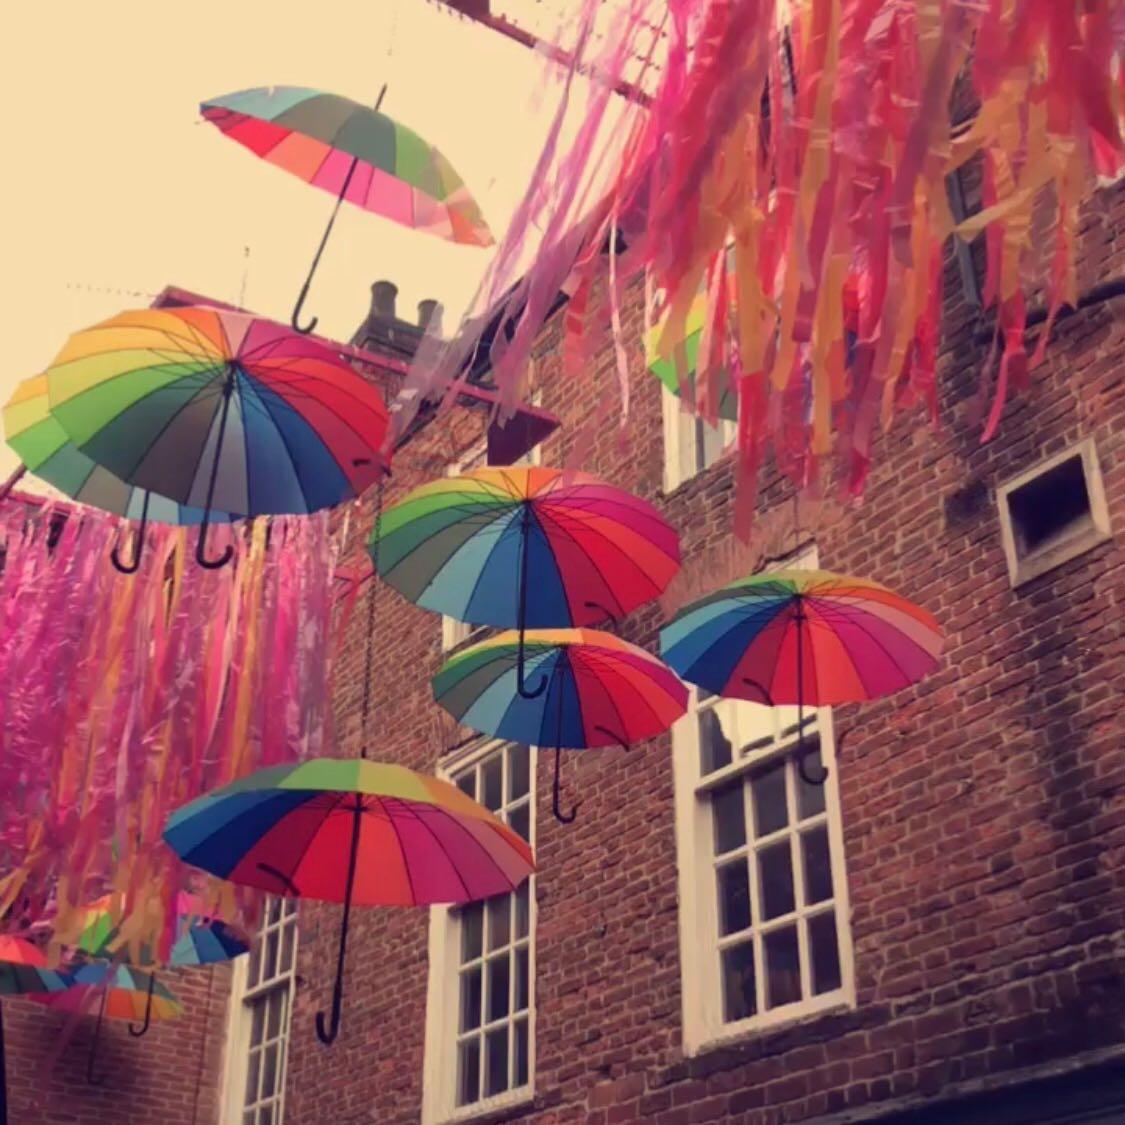 rainbow umbrellas hanging in the street